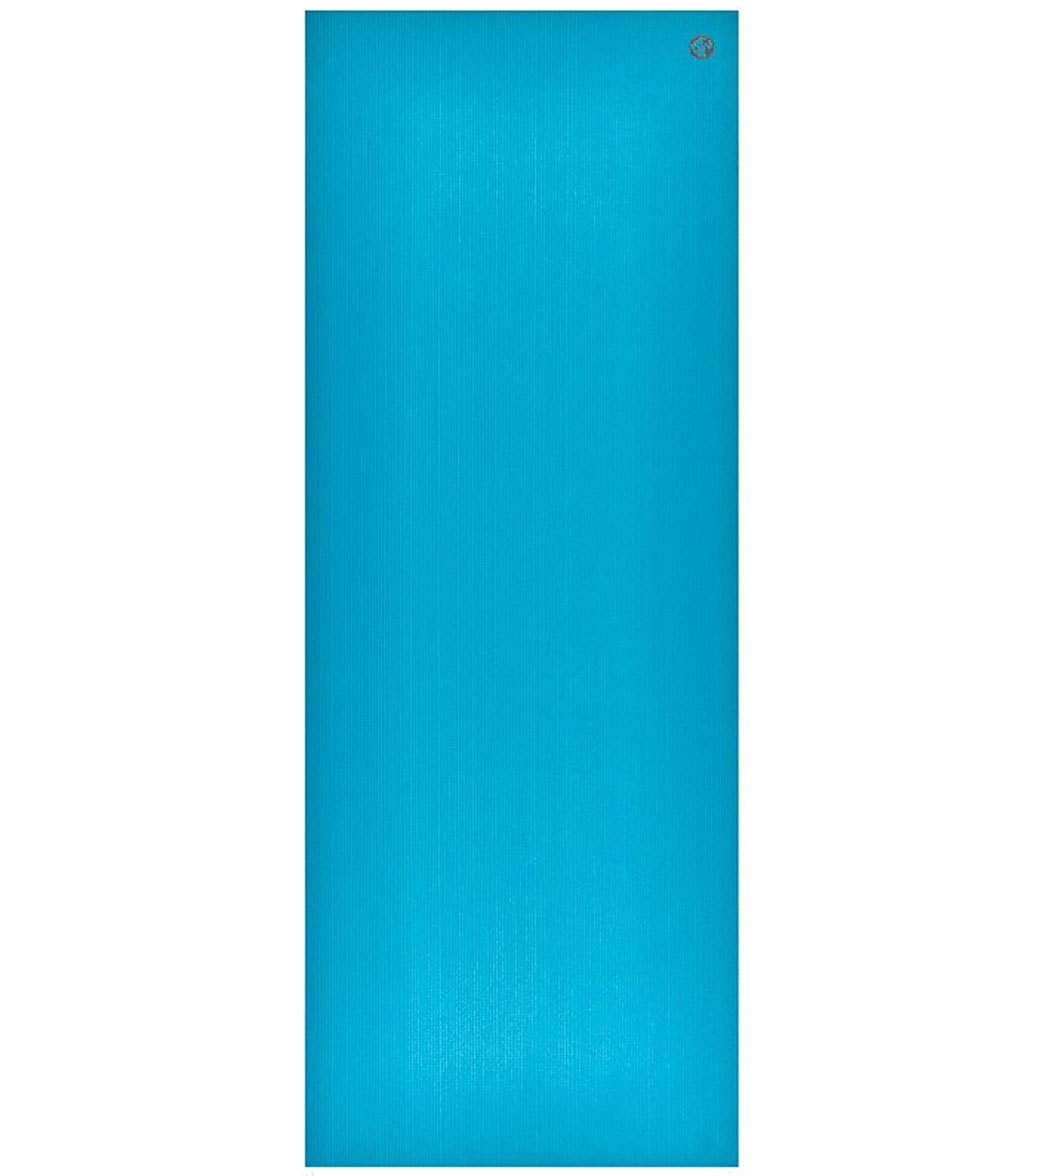 81ad6d6721c Manduka Pro Yoga Mat 71